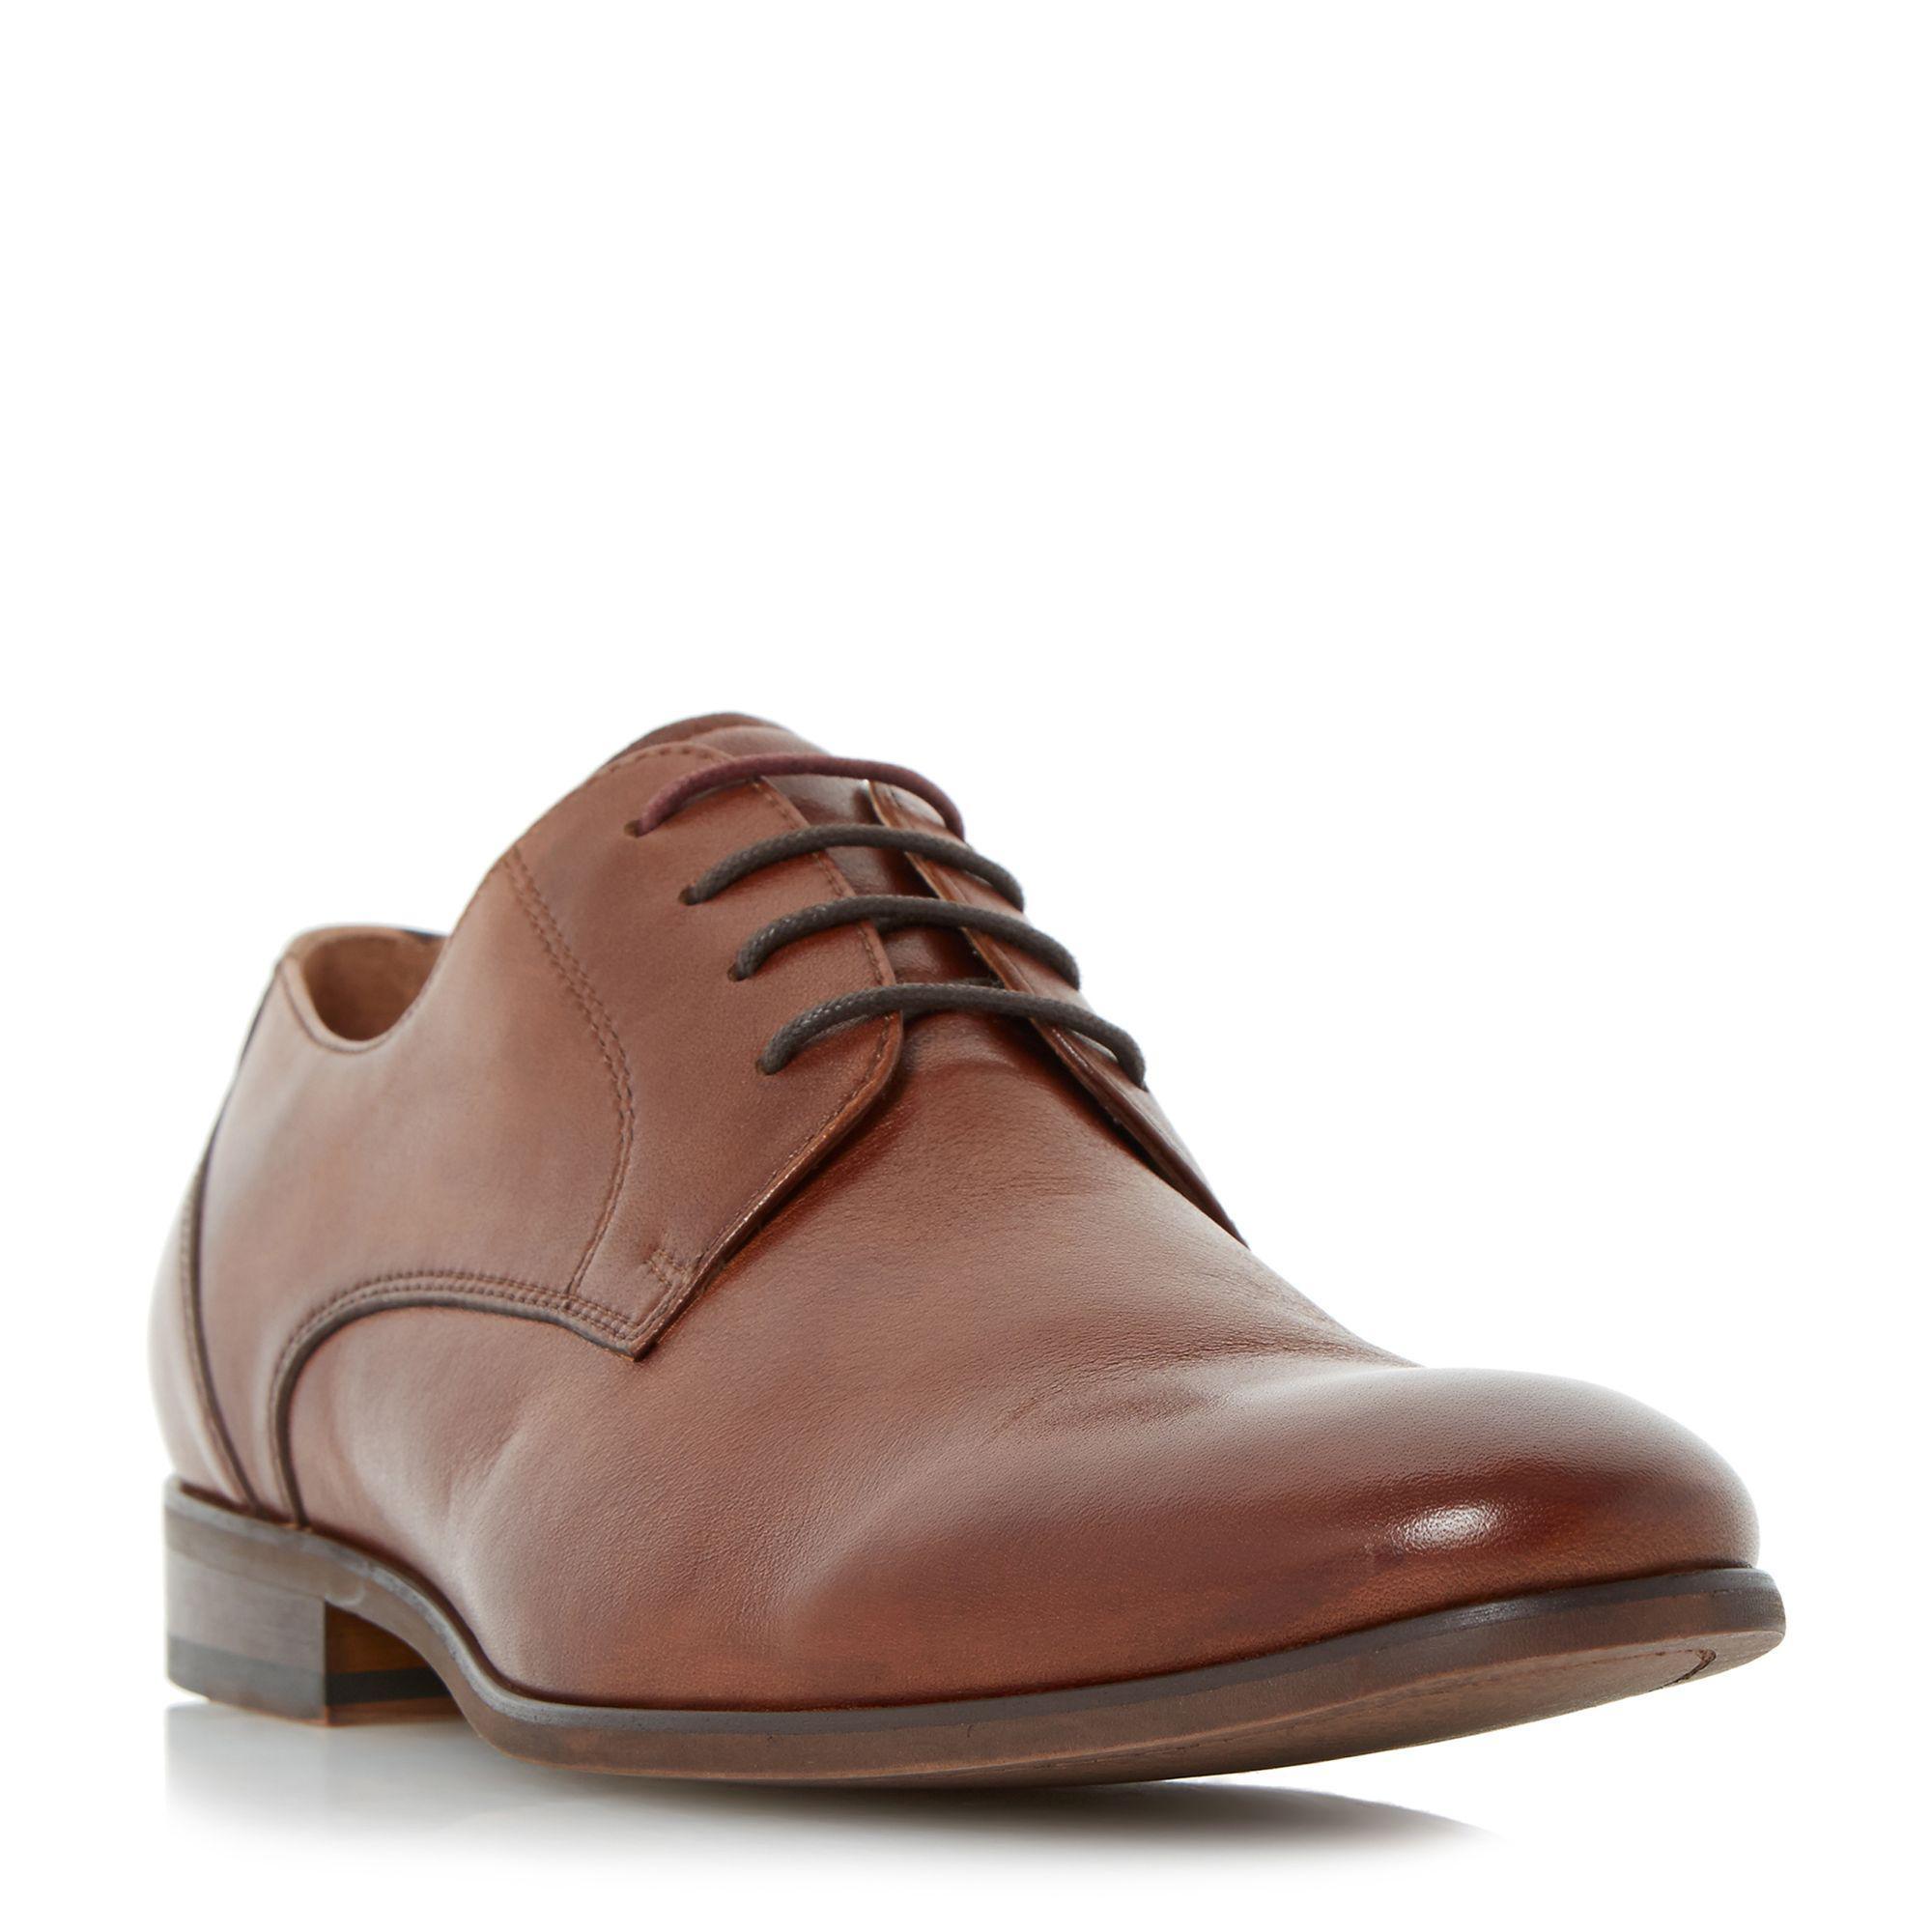 Debenhams Leather Shoe Sale